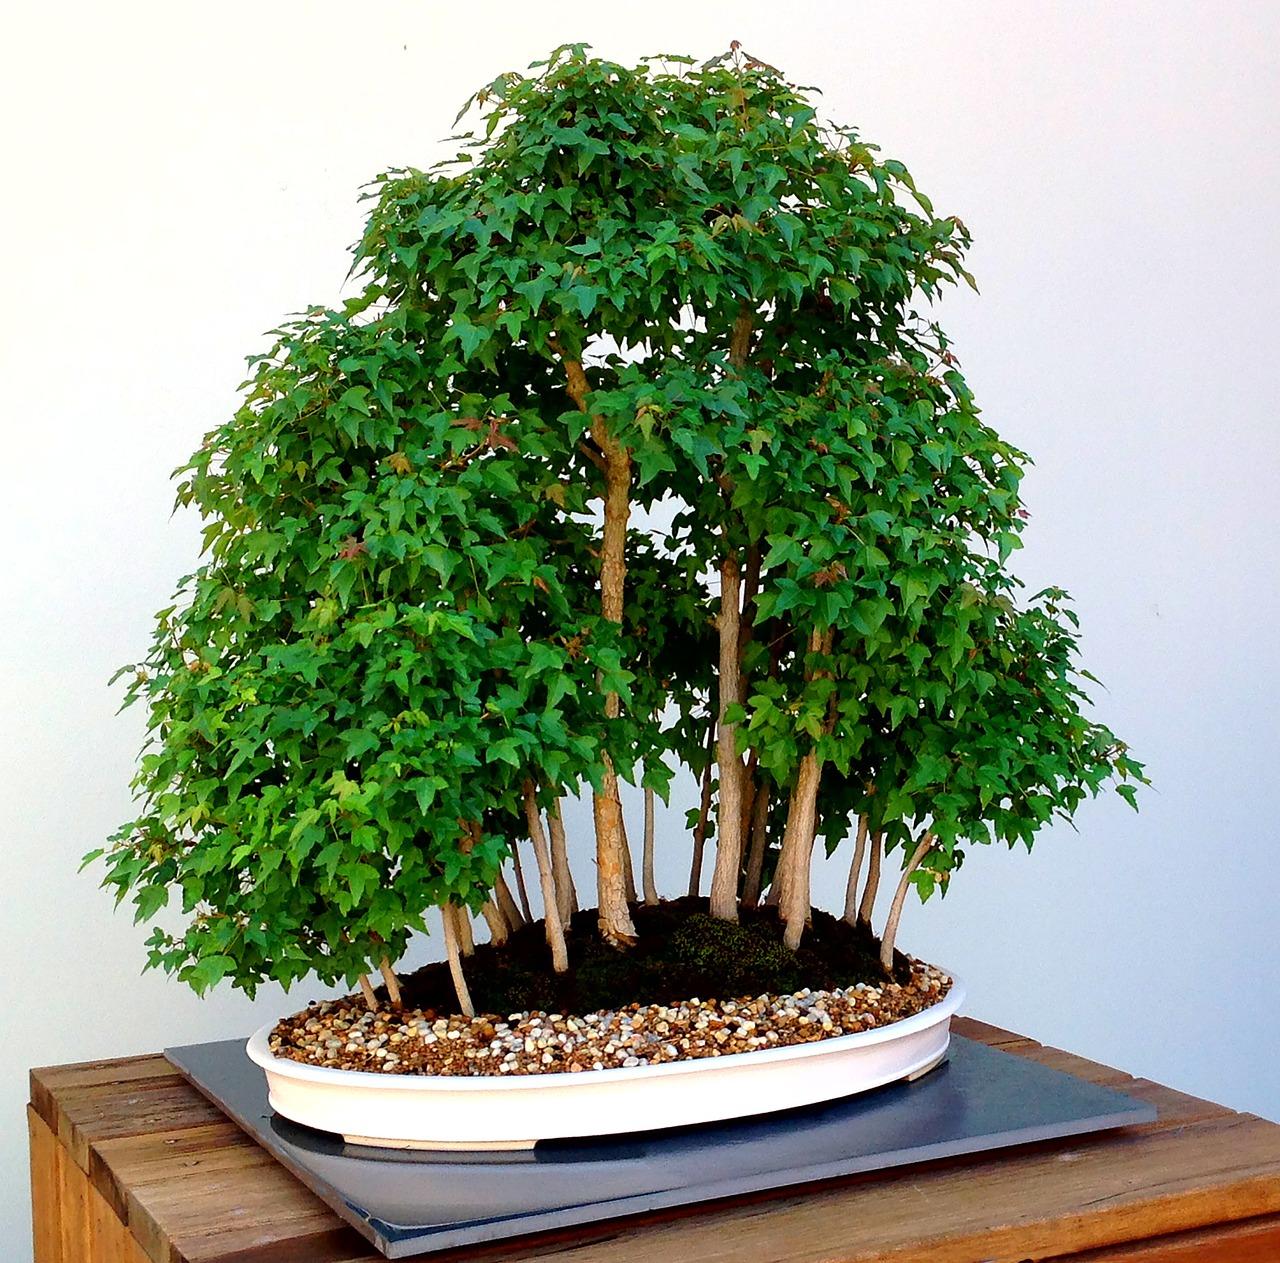 bonsai-1134685_1280.jpg